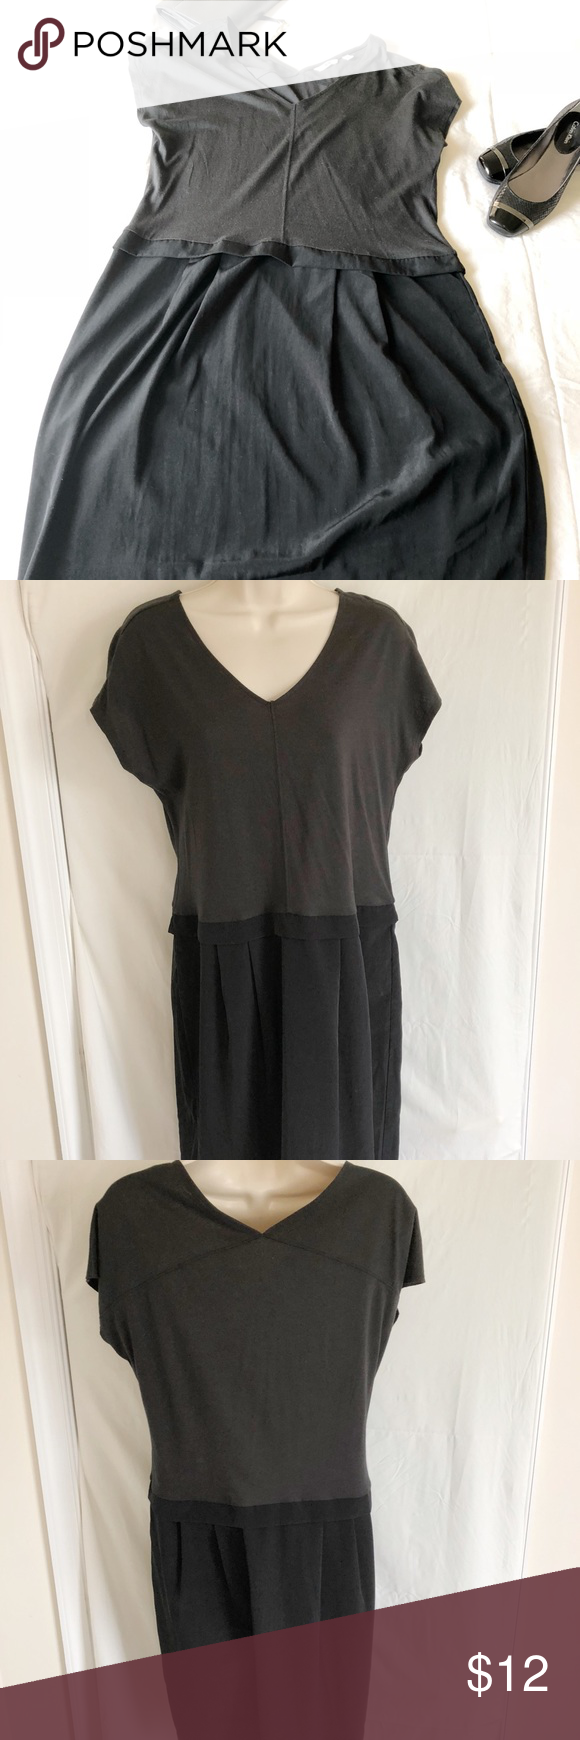 Uniqlo womenus shortsleeve dress black